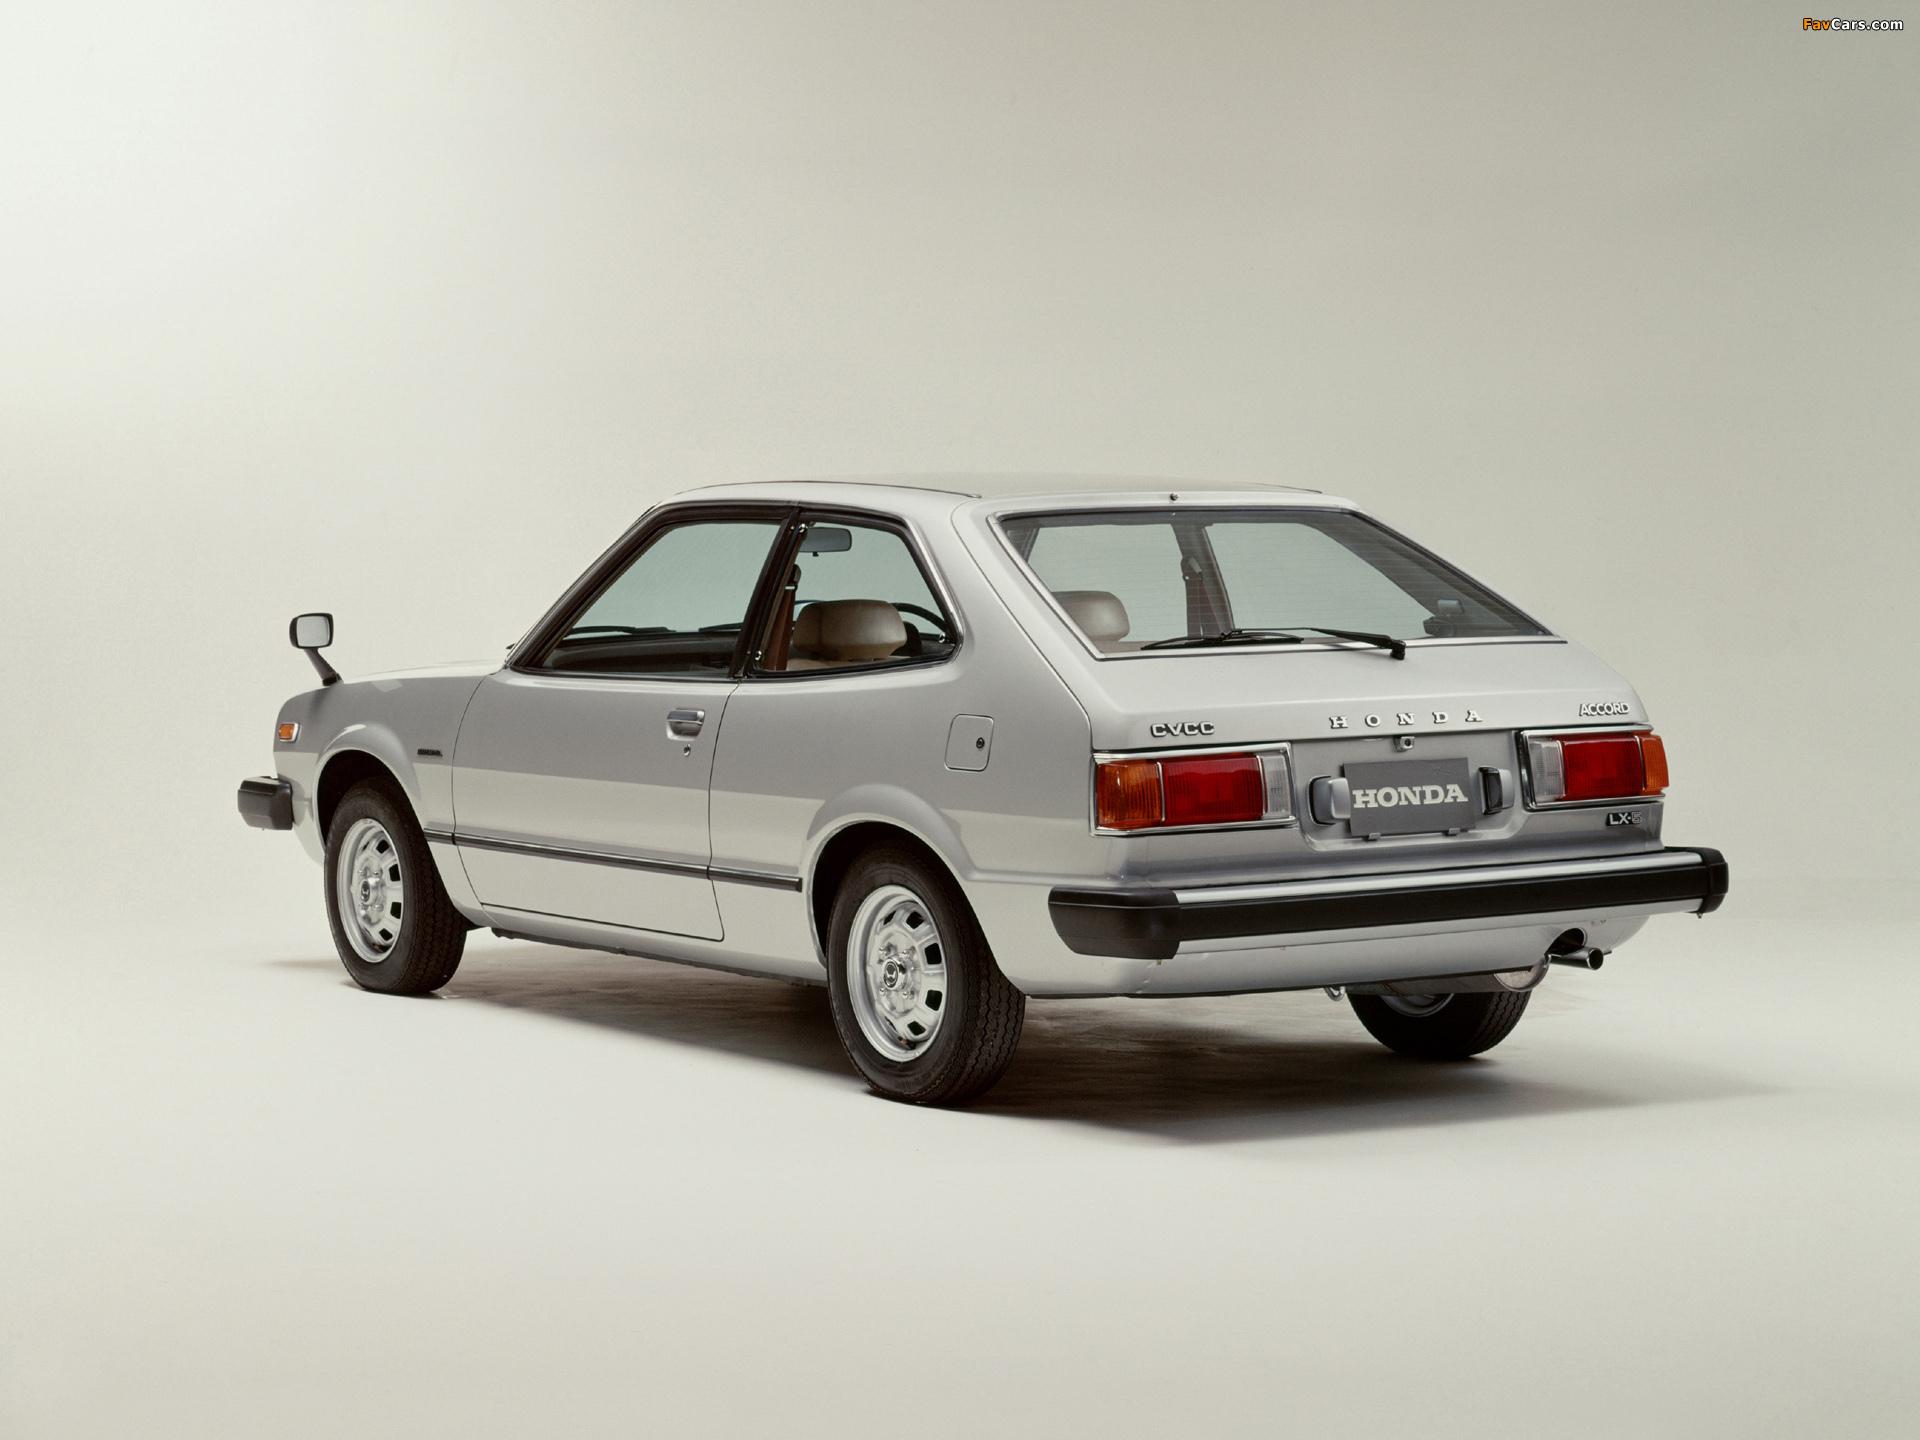 Honda Accord Hatchback 1976 81 Wallpapers 1920x1440